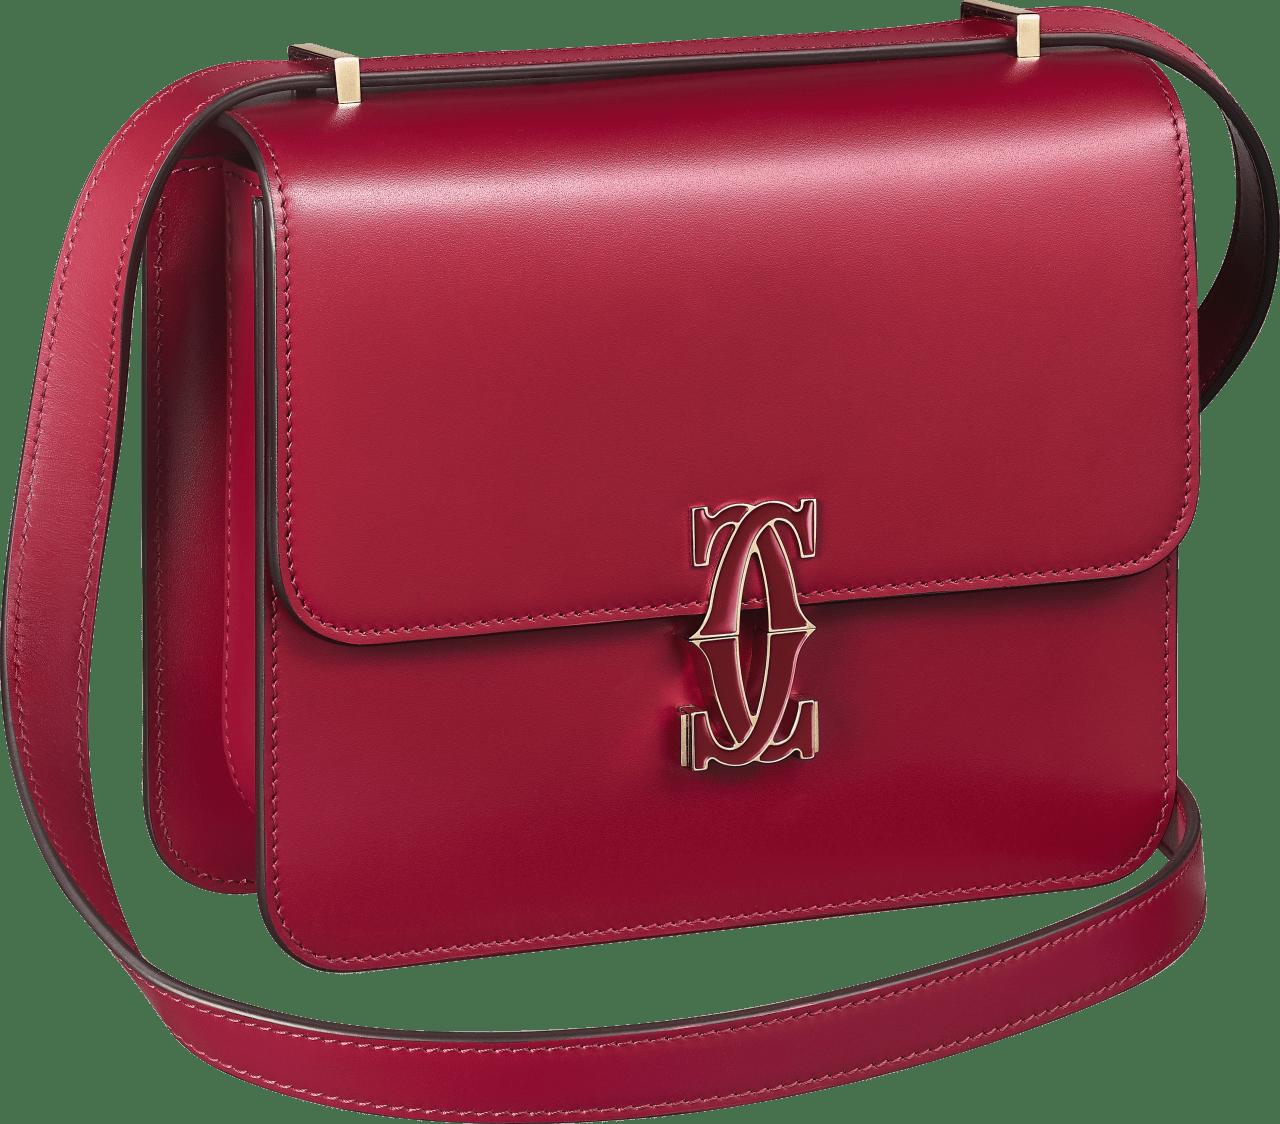 حقيبة كتف من مجموعة دوبل سي دو كارتييه«Double C De Cartier»